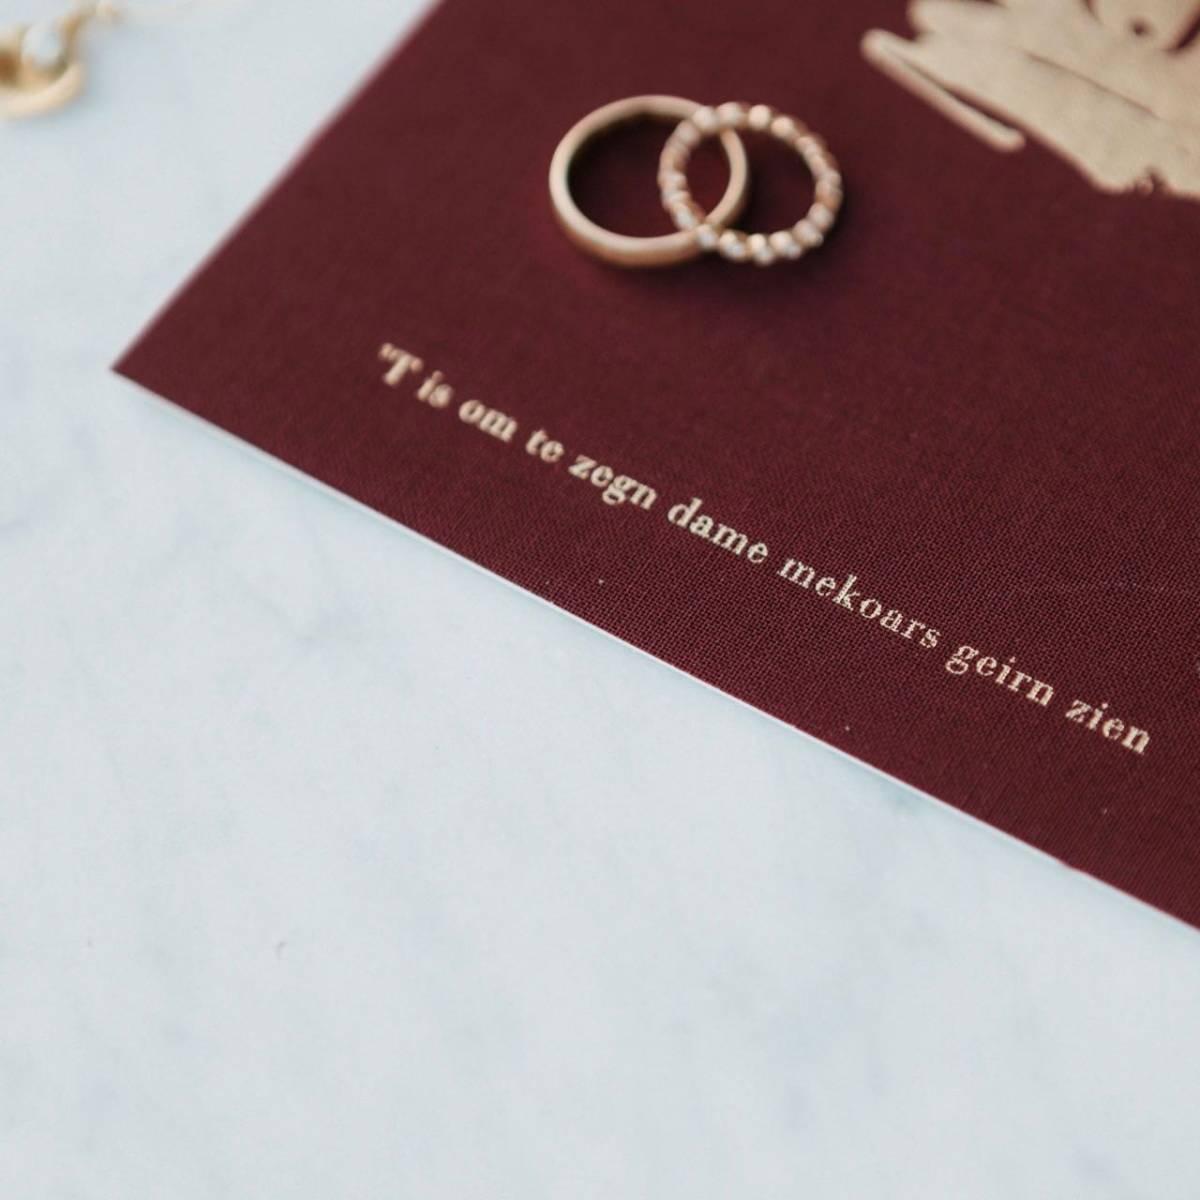 Scarabar - Trouwuitnodiging - Huwelijksuitnodiging - Drukwerk - Huwelijk - Trouw - Bruiloft - House of Weddings - 36